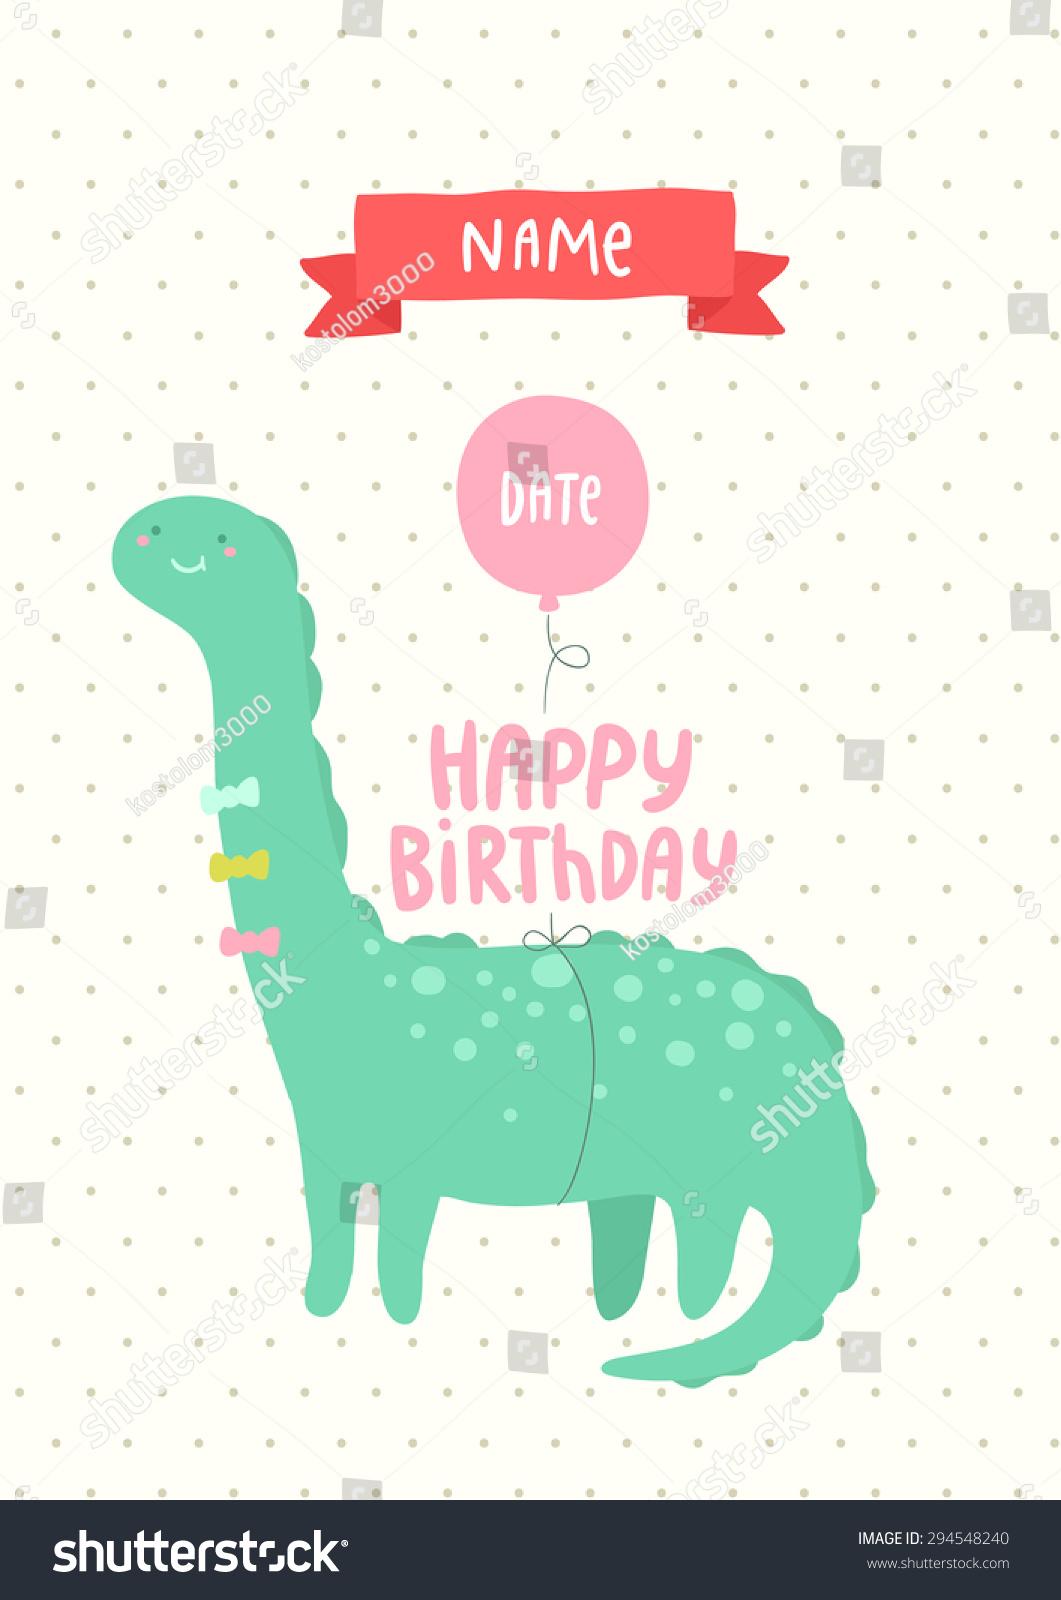 Happy Birthday Invitation Postcard With Cute Dinosaur ...